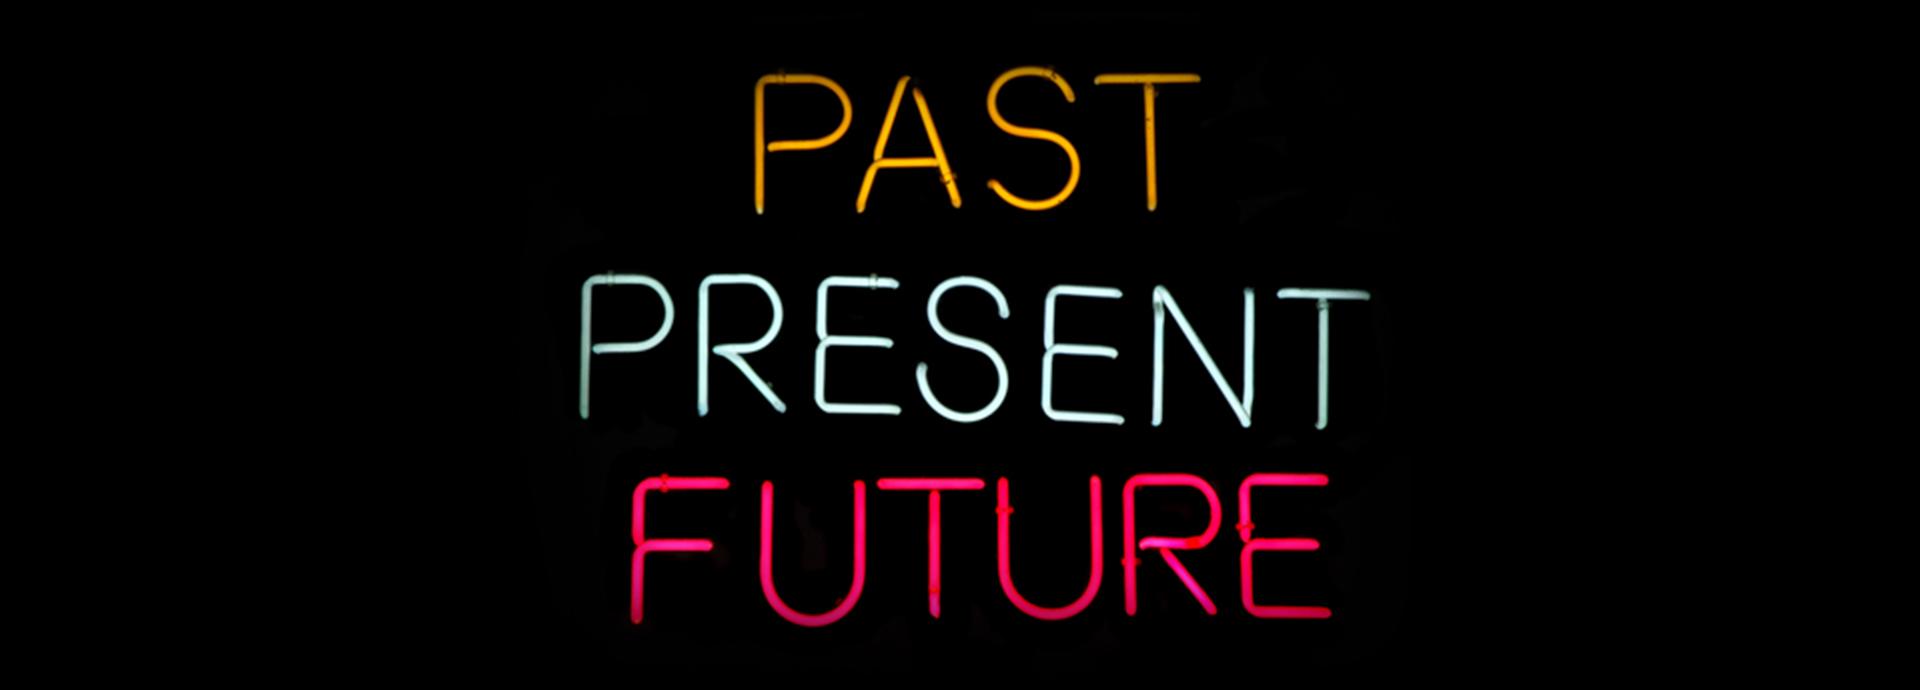 passato presente futuro mindfulness